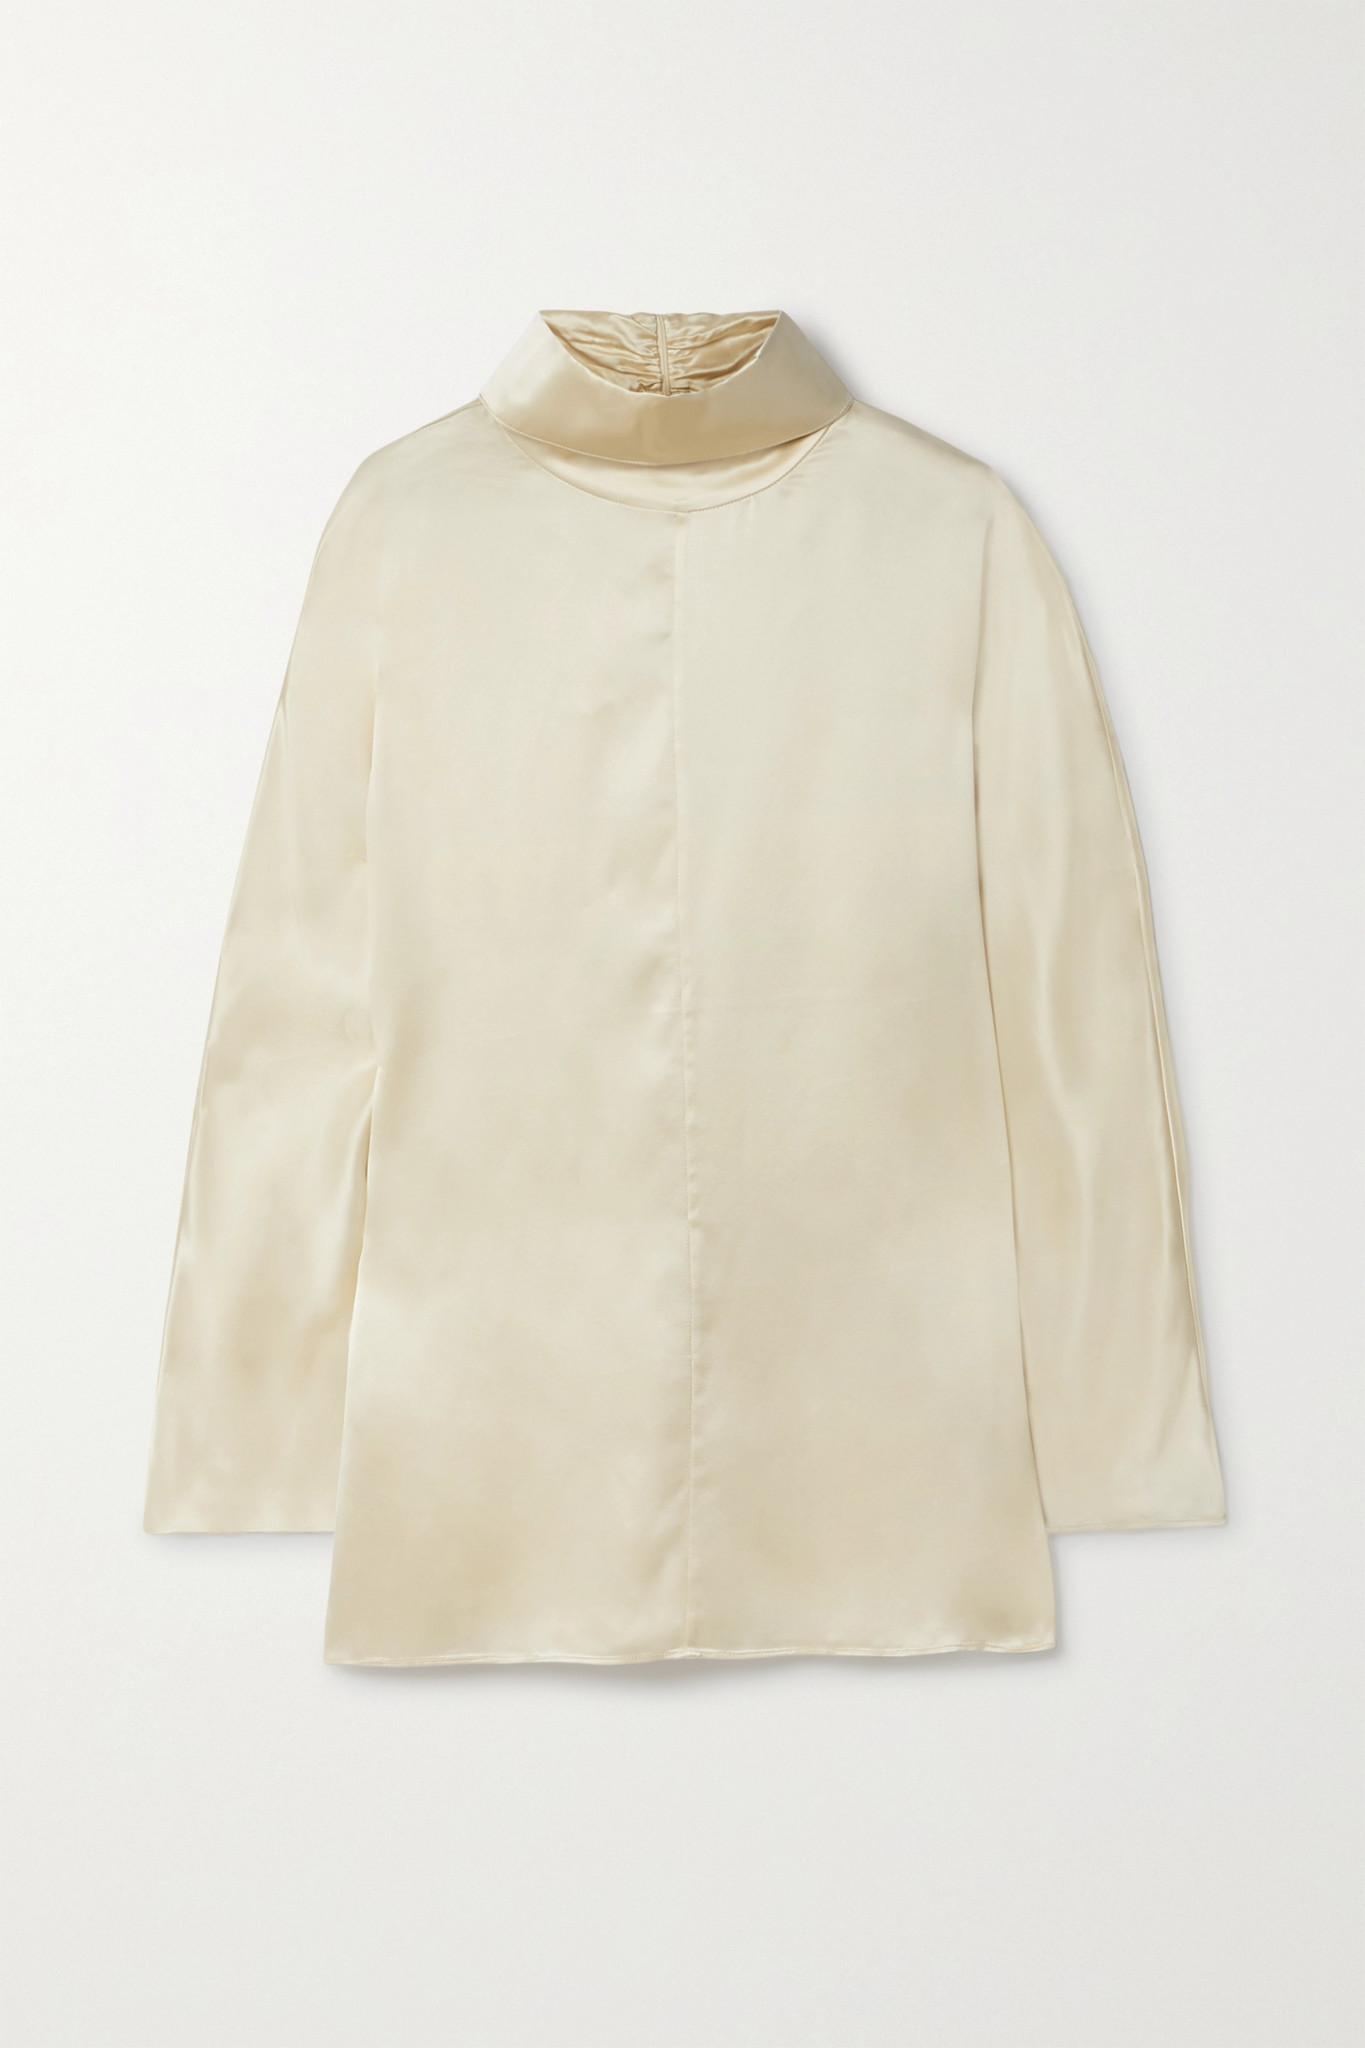 CO - Silk-satin Turtleneck Blouse - Cream - large